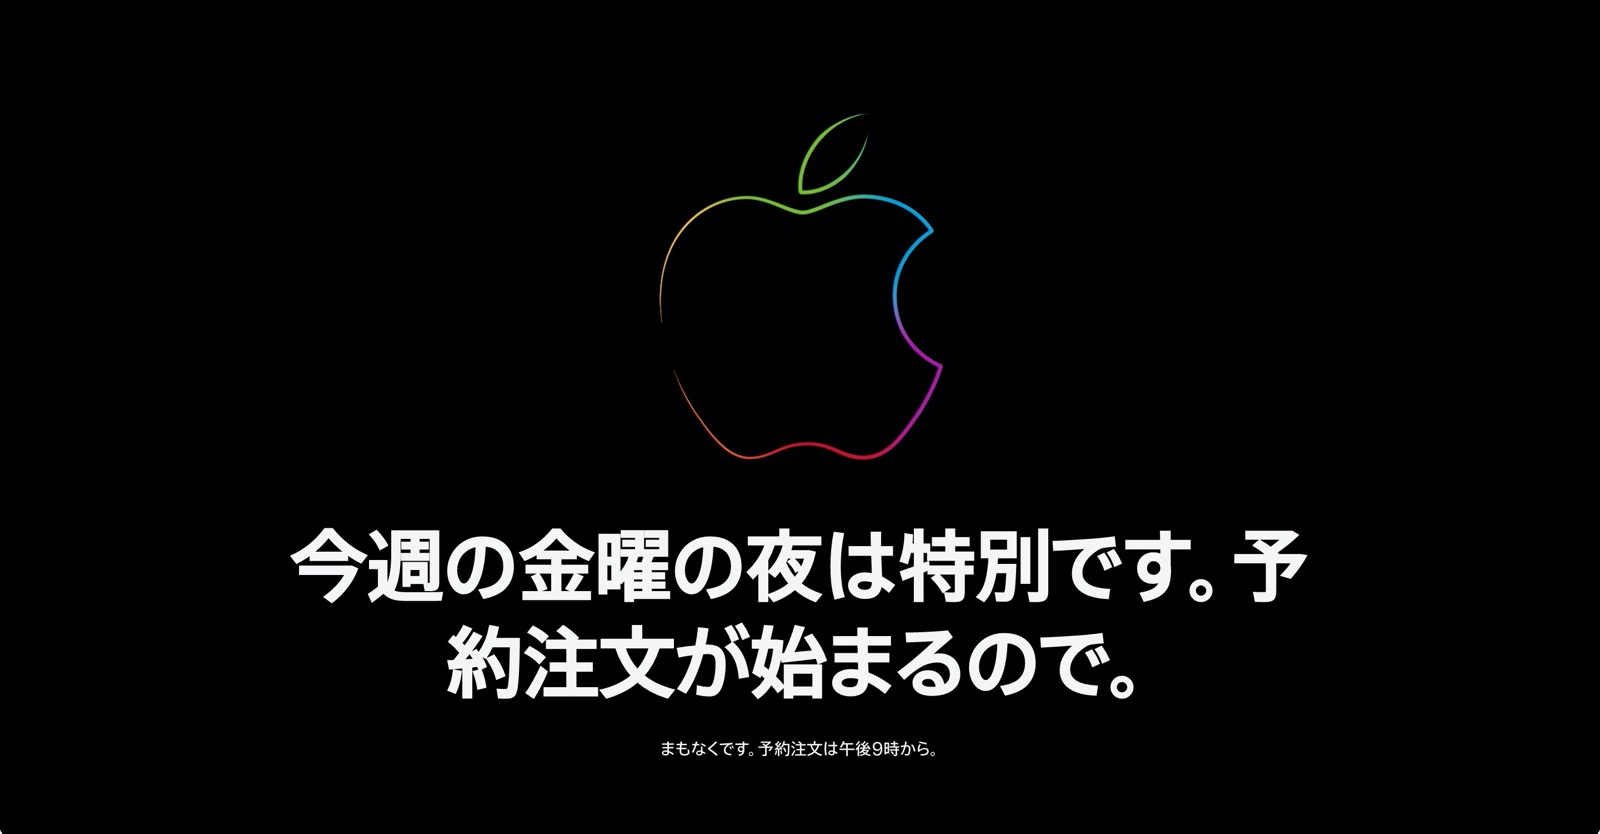 Apple公式サイトがメンテ中に。「iPhone SE」今夜予約スタート